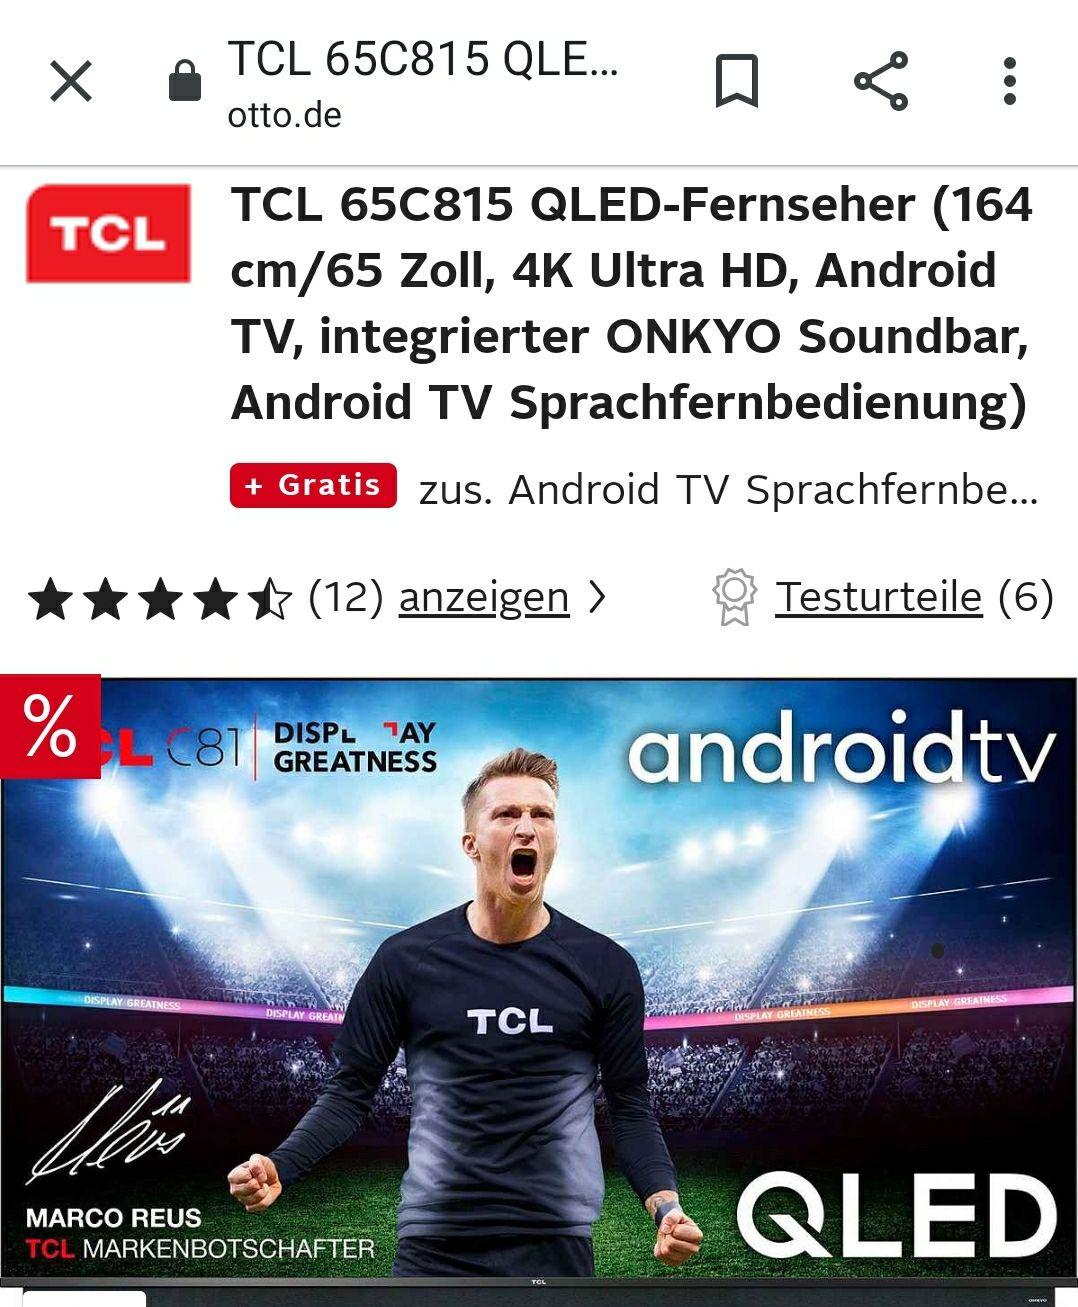 TCL 65C815 QLED-Fernseher (164 cm/65 Zoll, 4K Ultra HD, Android TV, integrierter ONKYO Soundbar, Android TV Sprachfernbedienung)